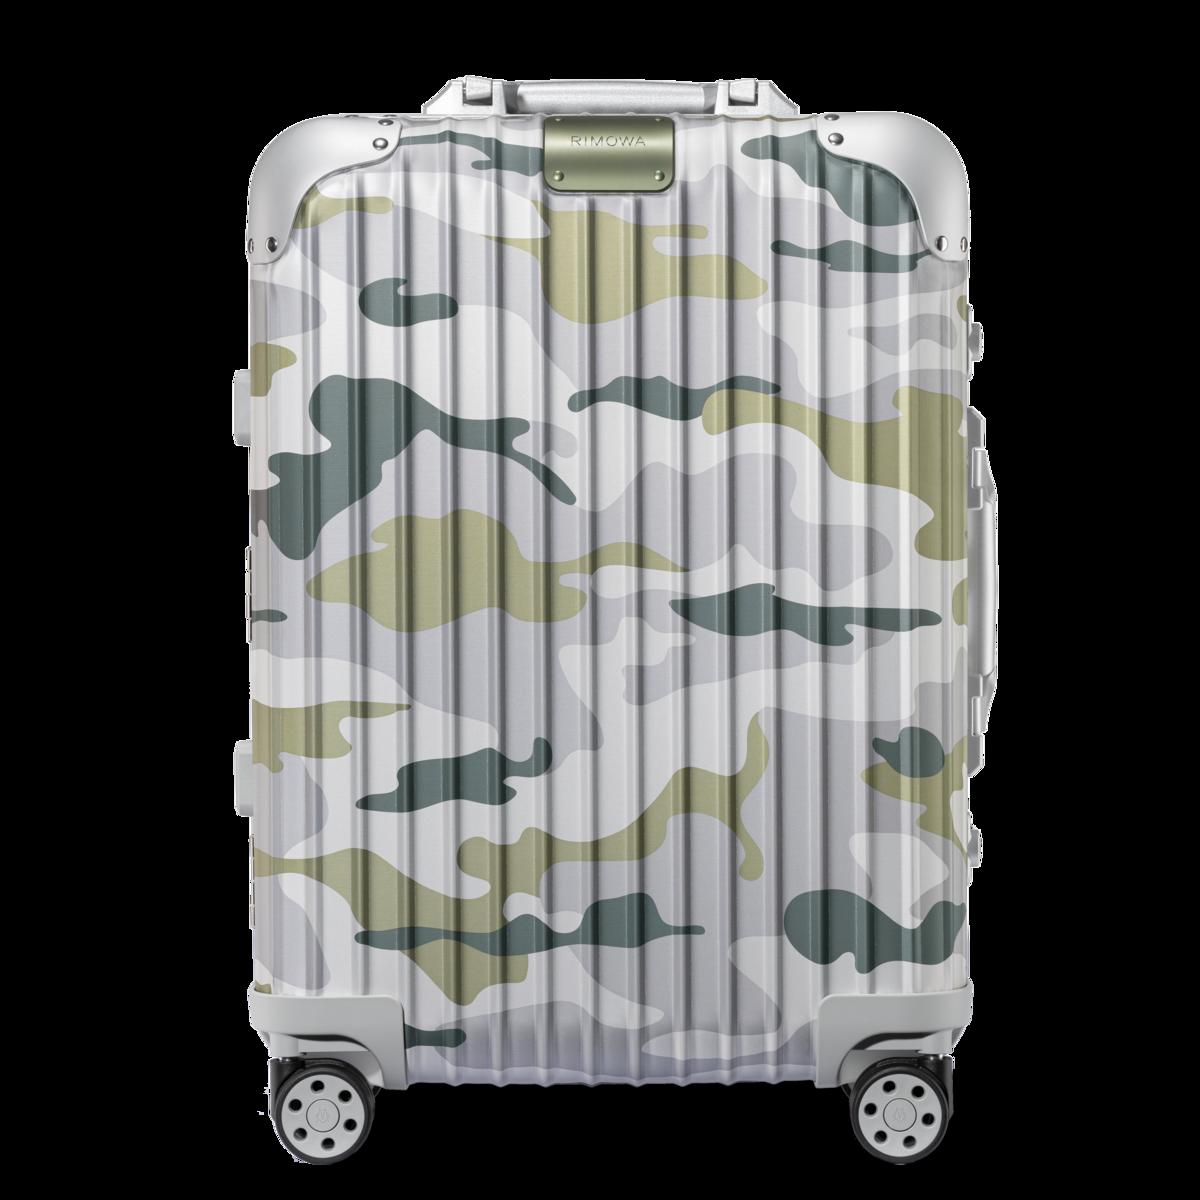 RIMOWA Original系列Cabin Green Camouflage價格電洽。(RIMOWA提供)